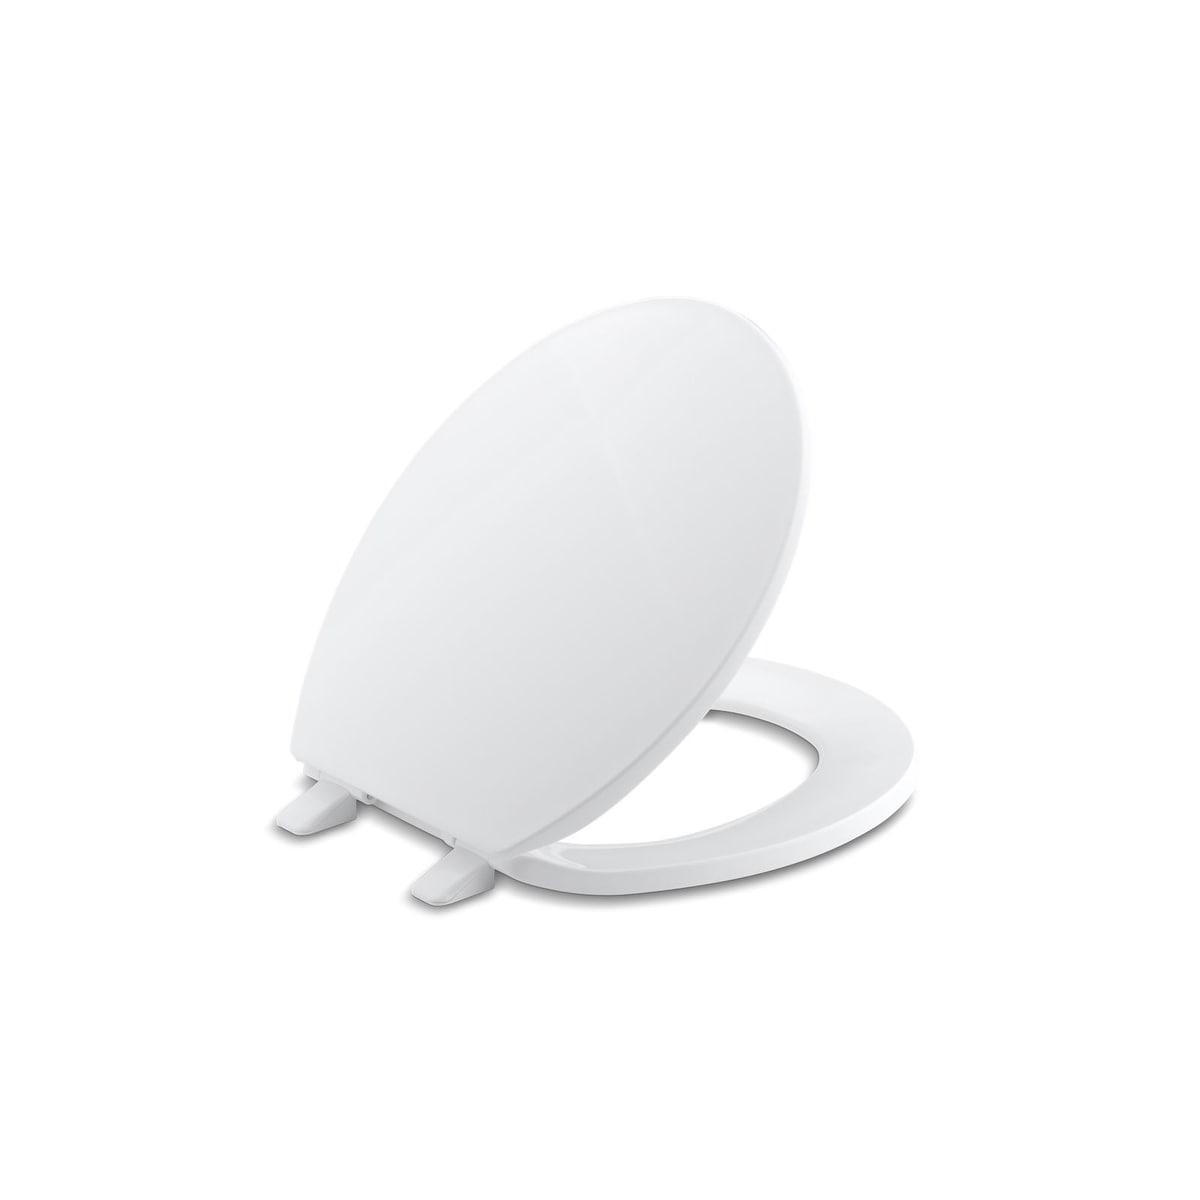 Super Kohler Brevia Plastic Round Toilet Seat K 4775 47 Almond Uwap Interior Chair Design Uwaporg